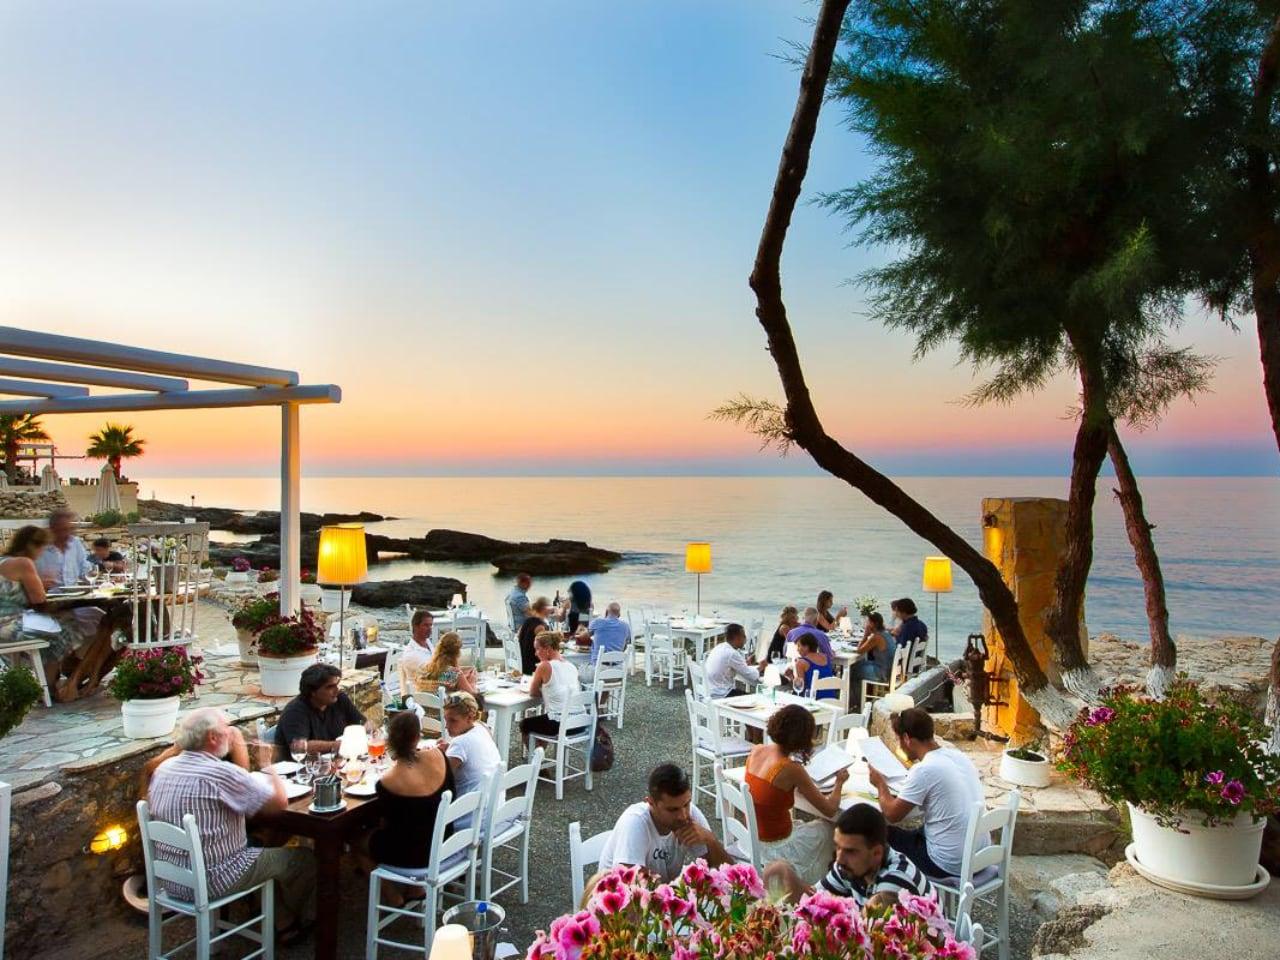 rethymnon days summer festival, rethimno summer festival crete, music art events rethimno, things to do rethymno, rethymno activities